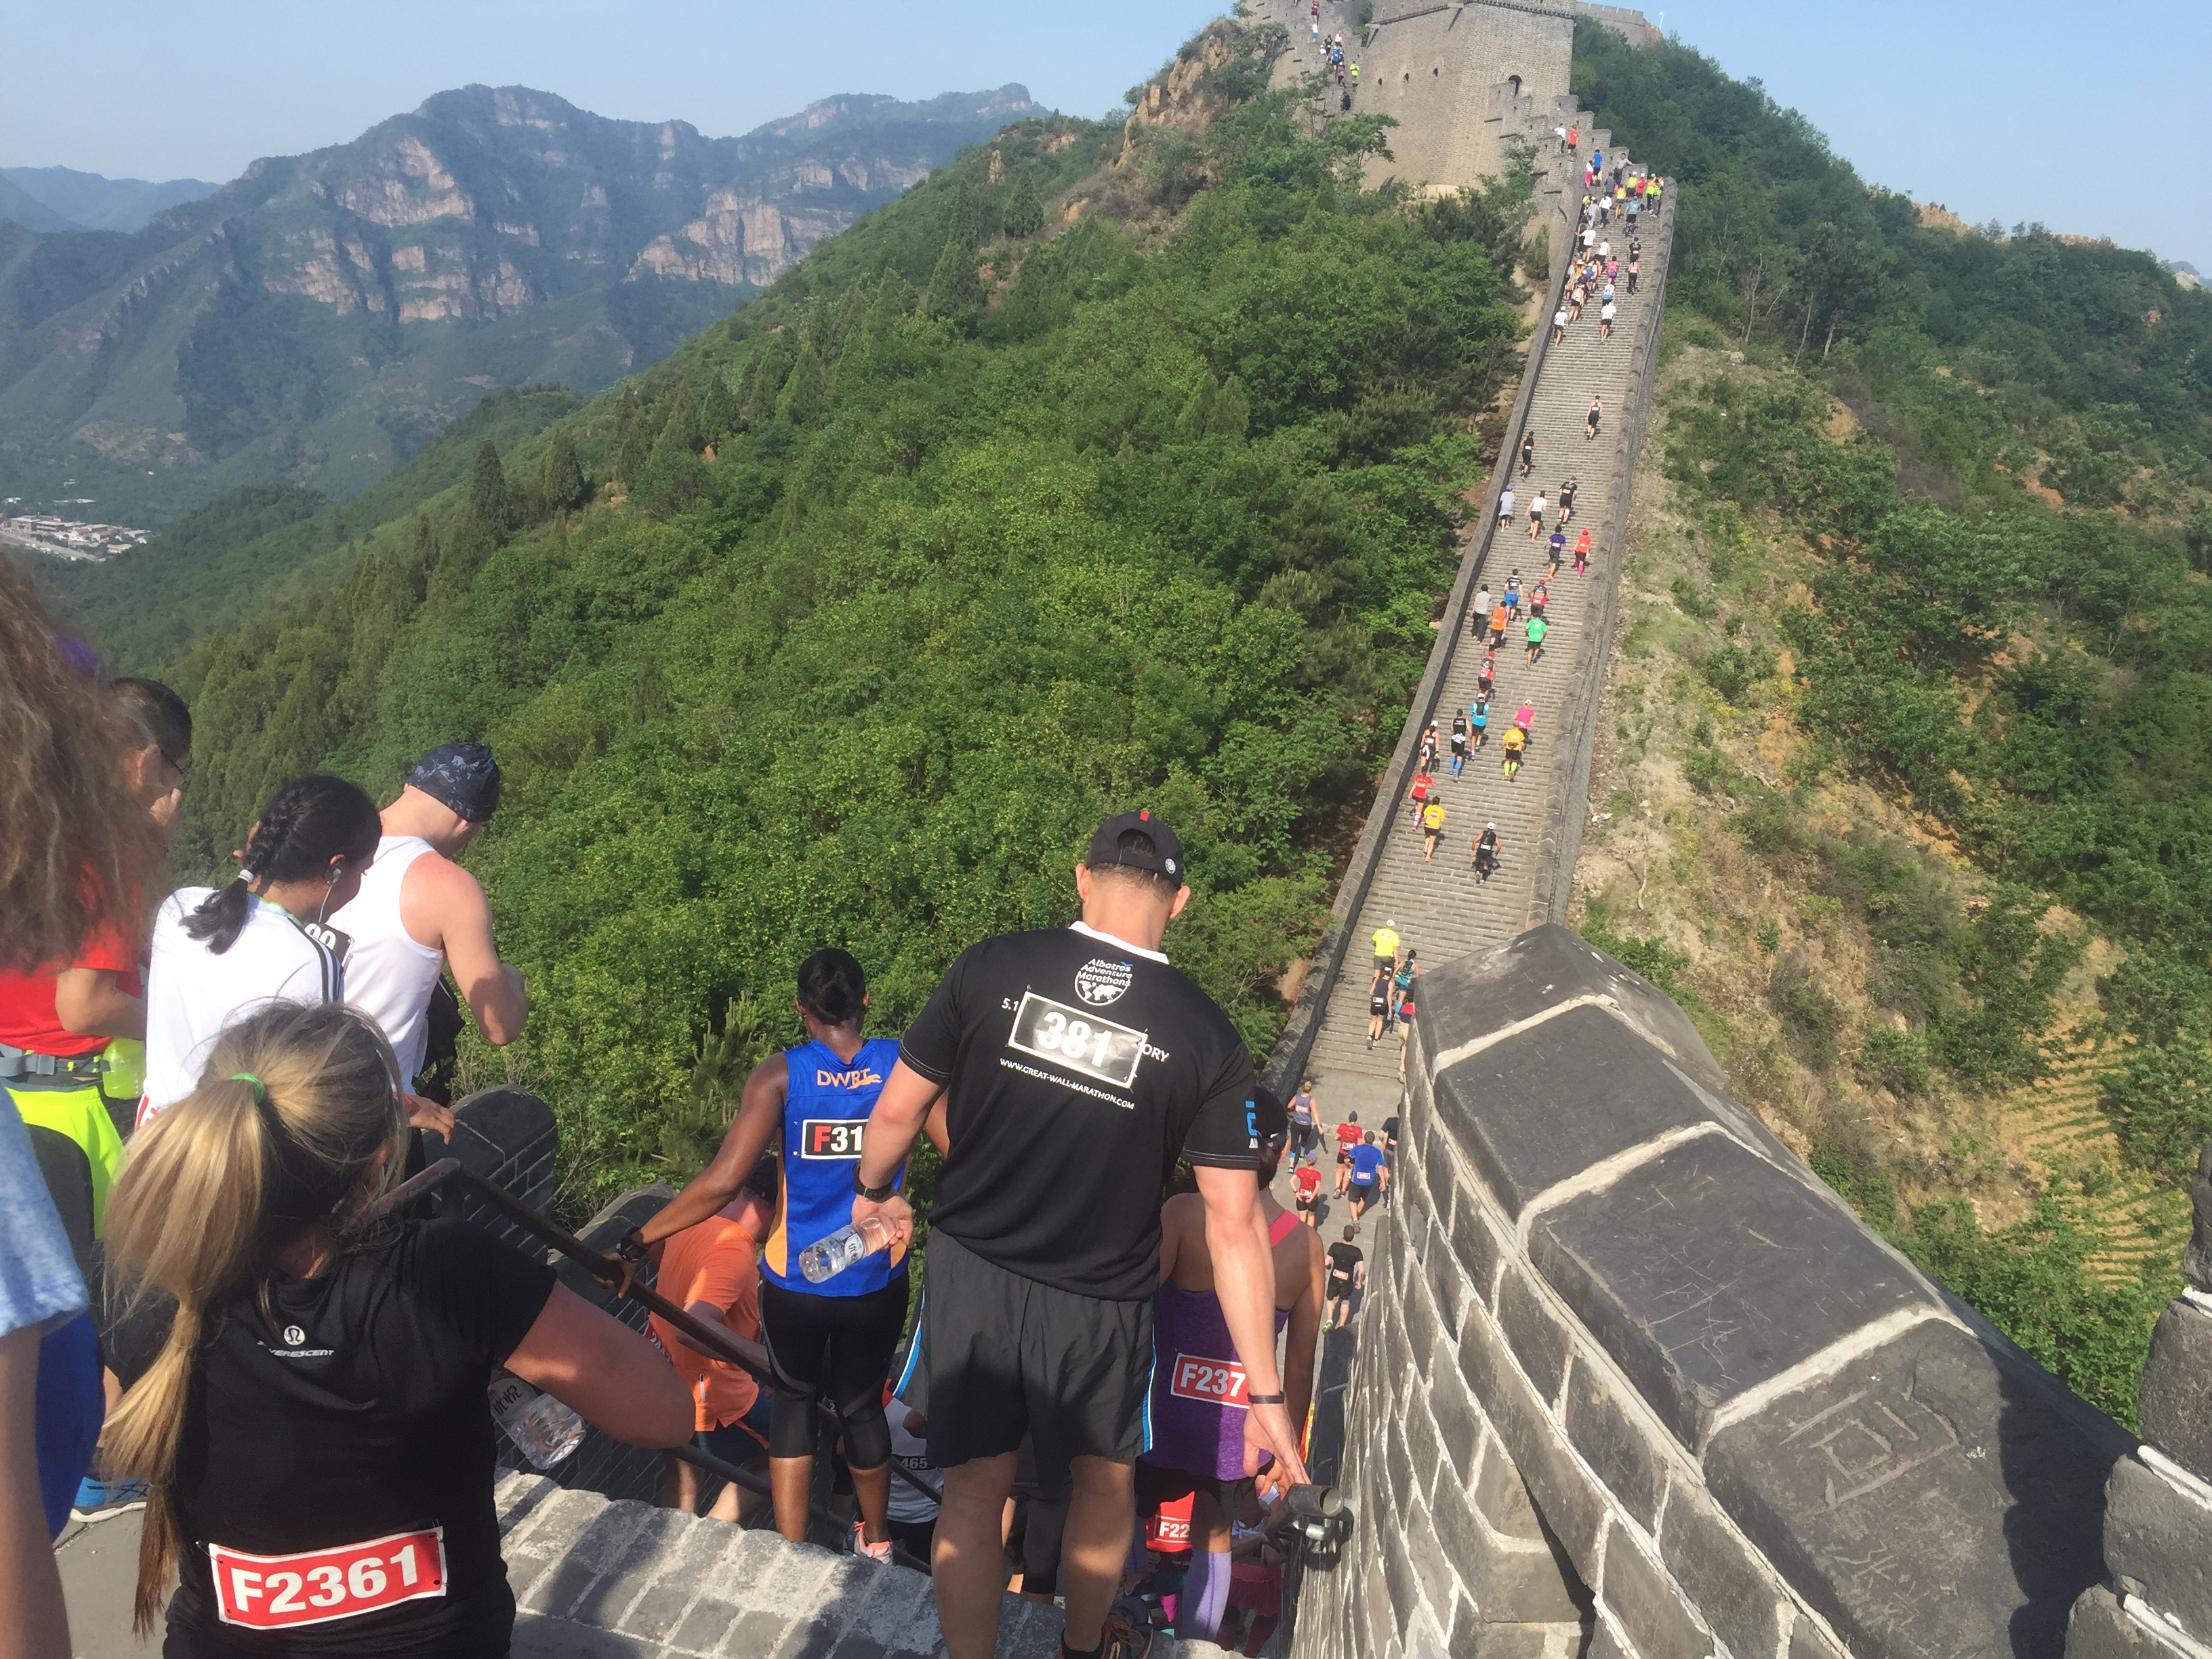 The Great Wall Half Marathon Lonna Hill - Great wall marathon